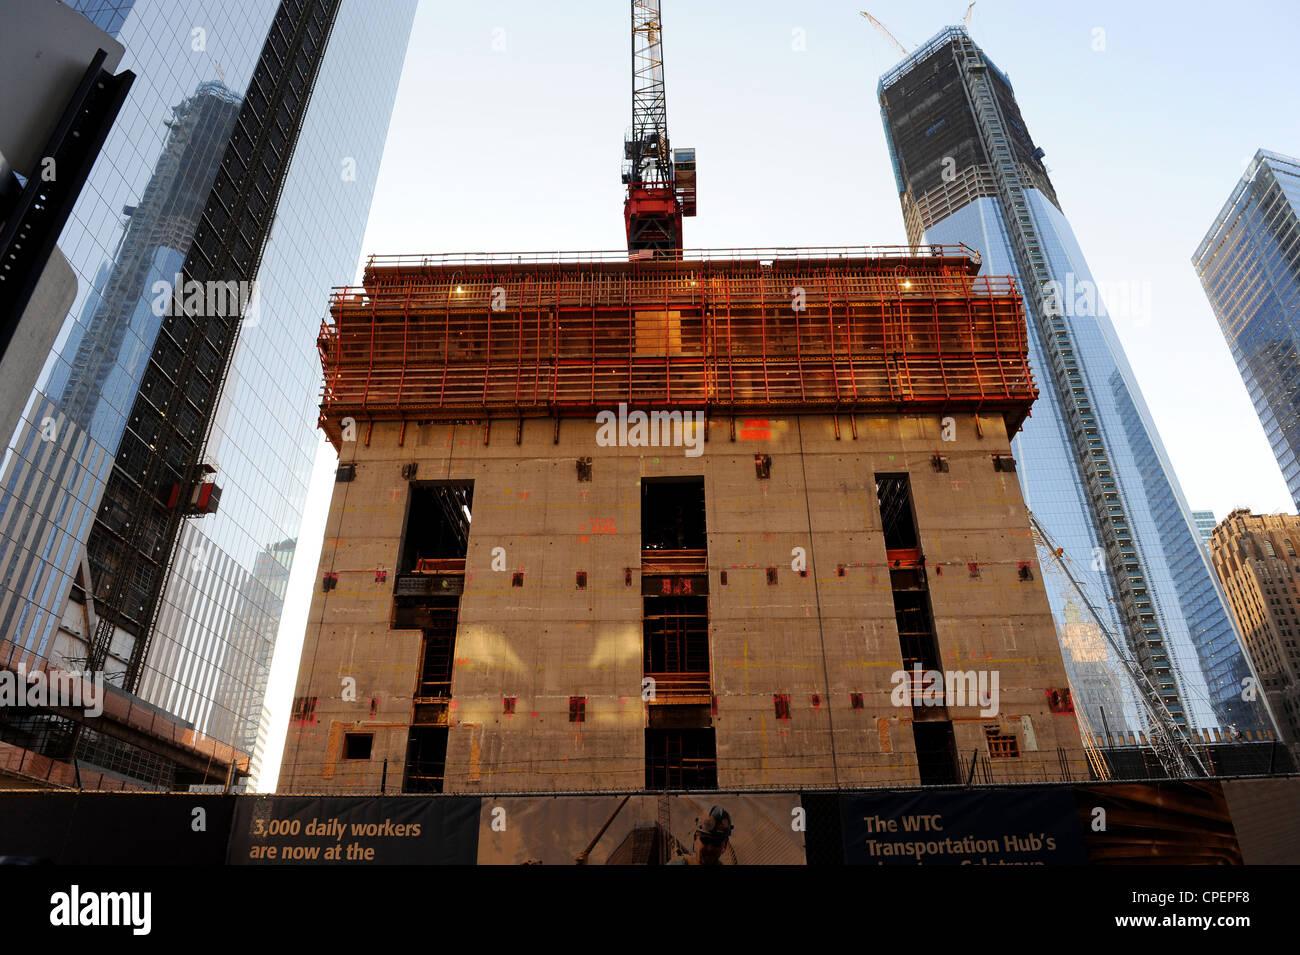 Tower 4, WTC, New York - Stock Image